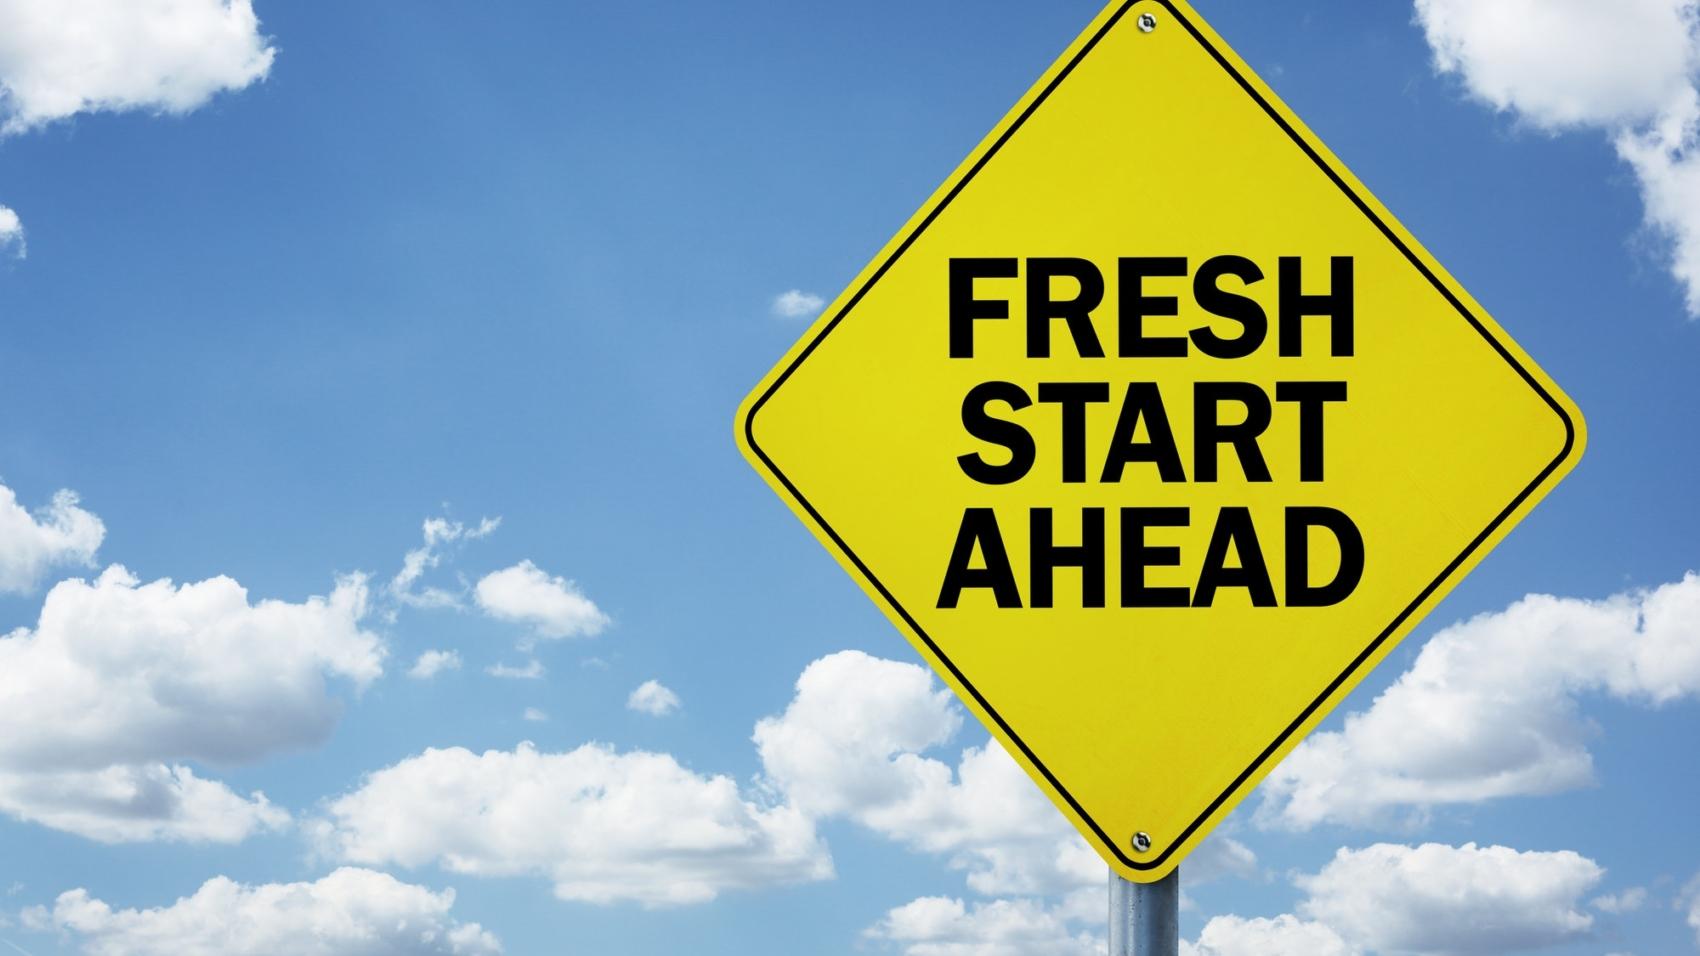 Fresh start ahead road sign by BrianAJackson